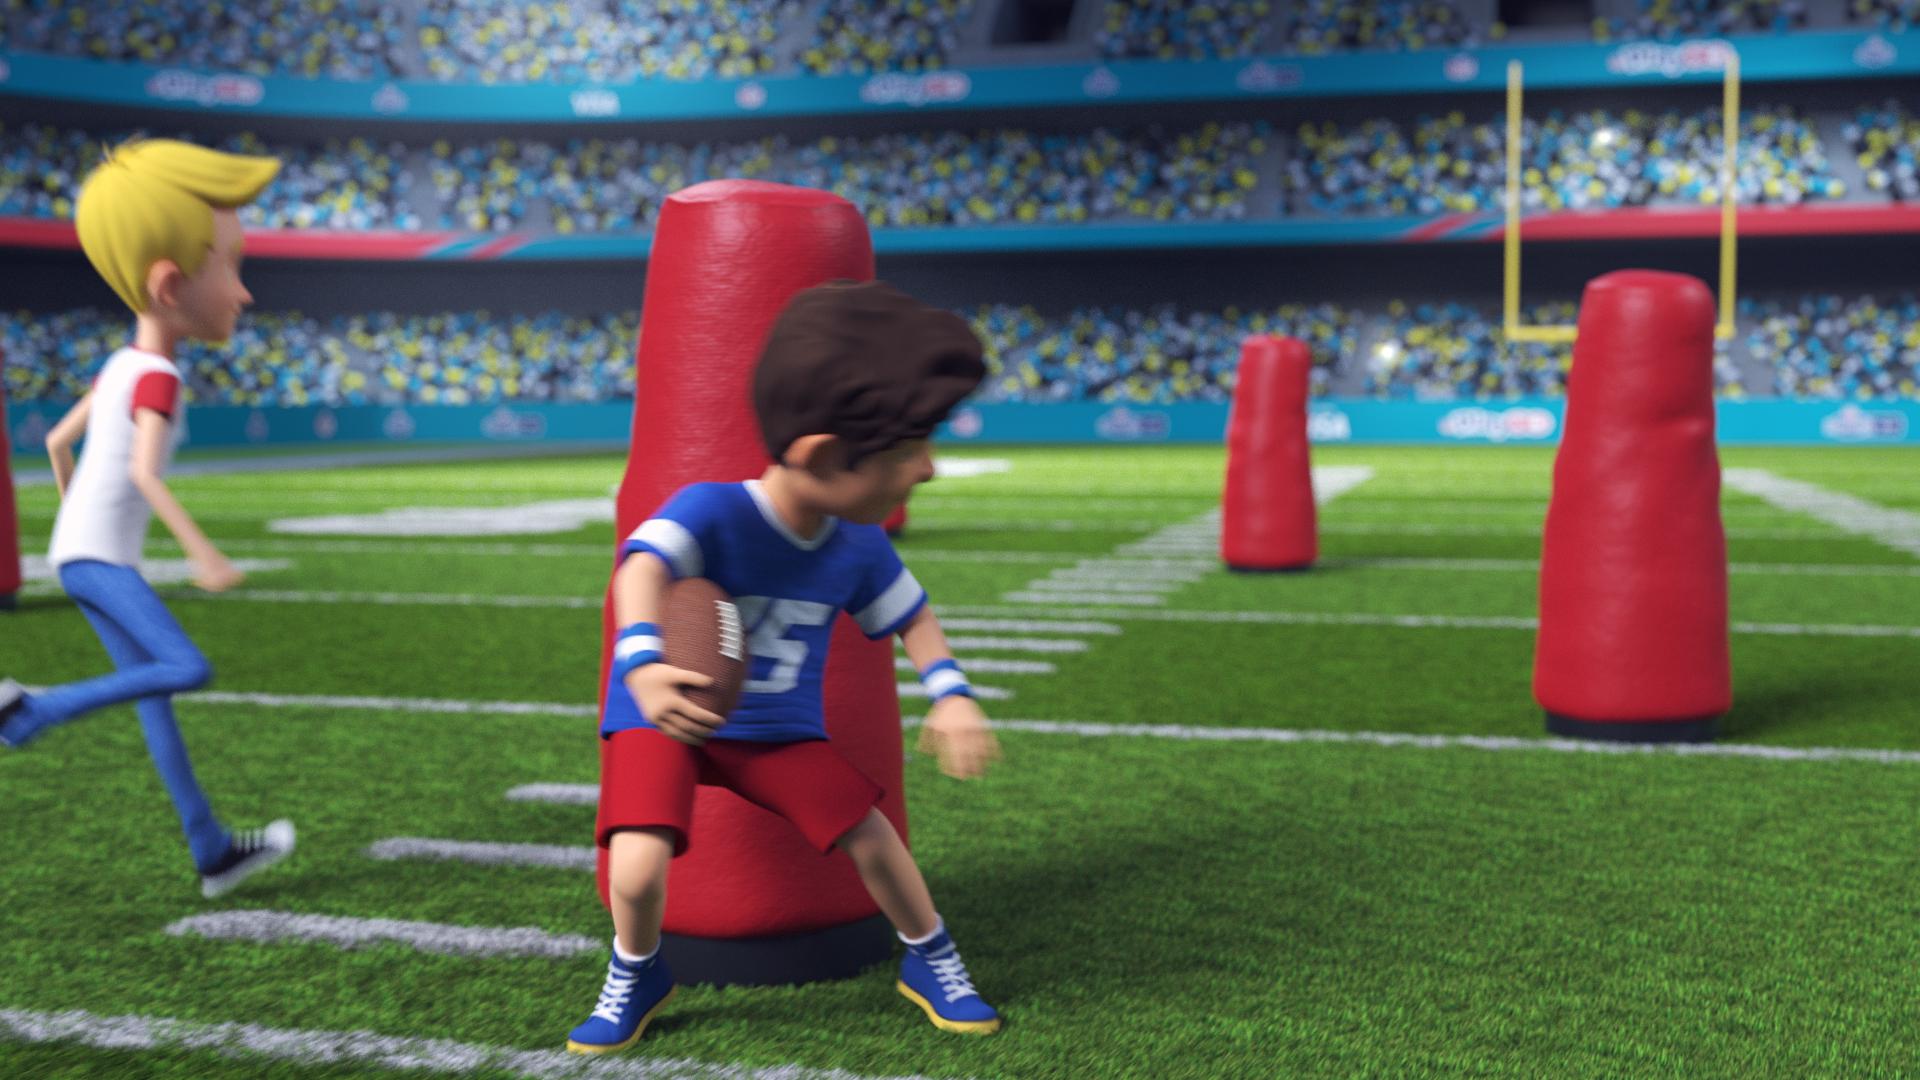 NFL_Experience_2016_30_RKS_1145.jpg